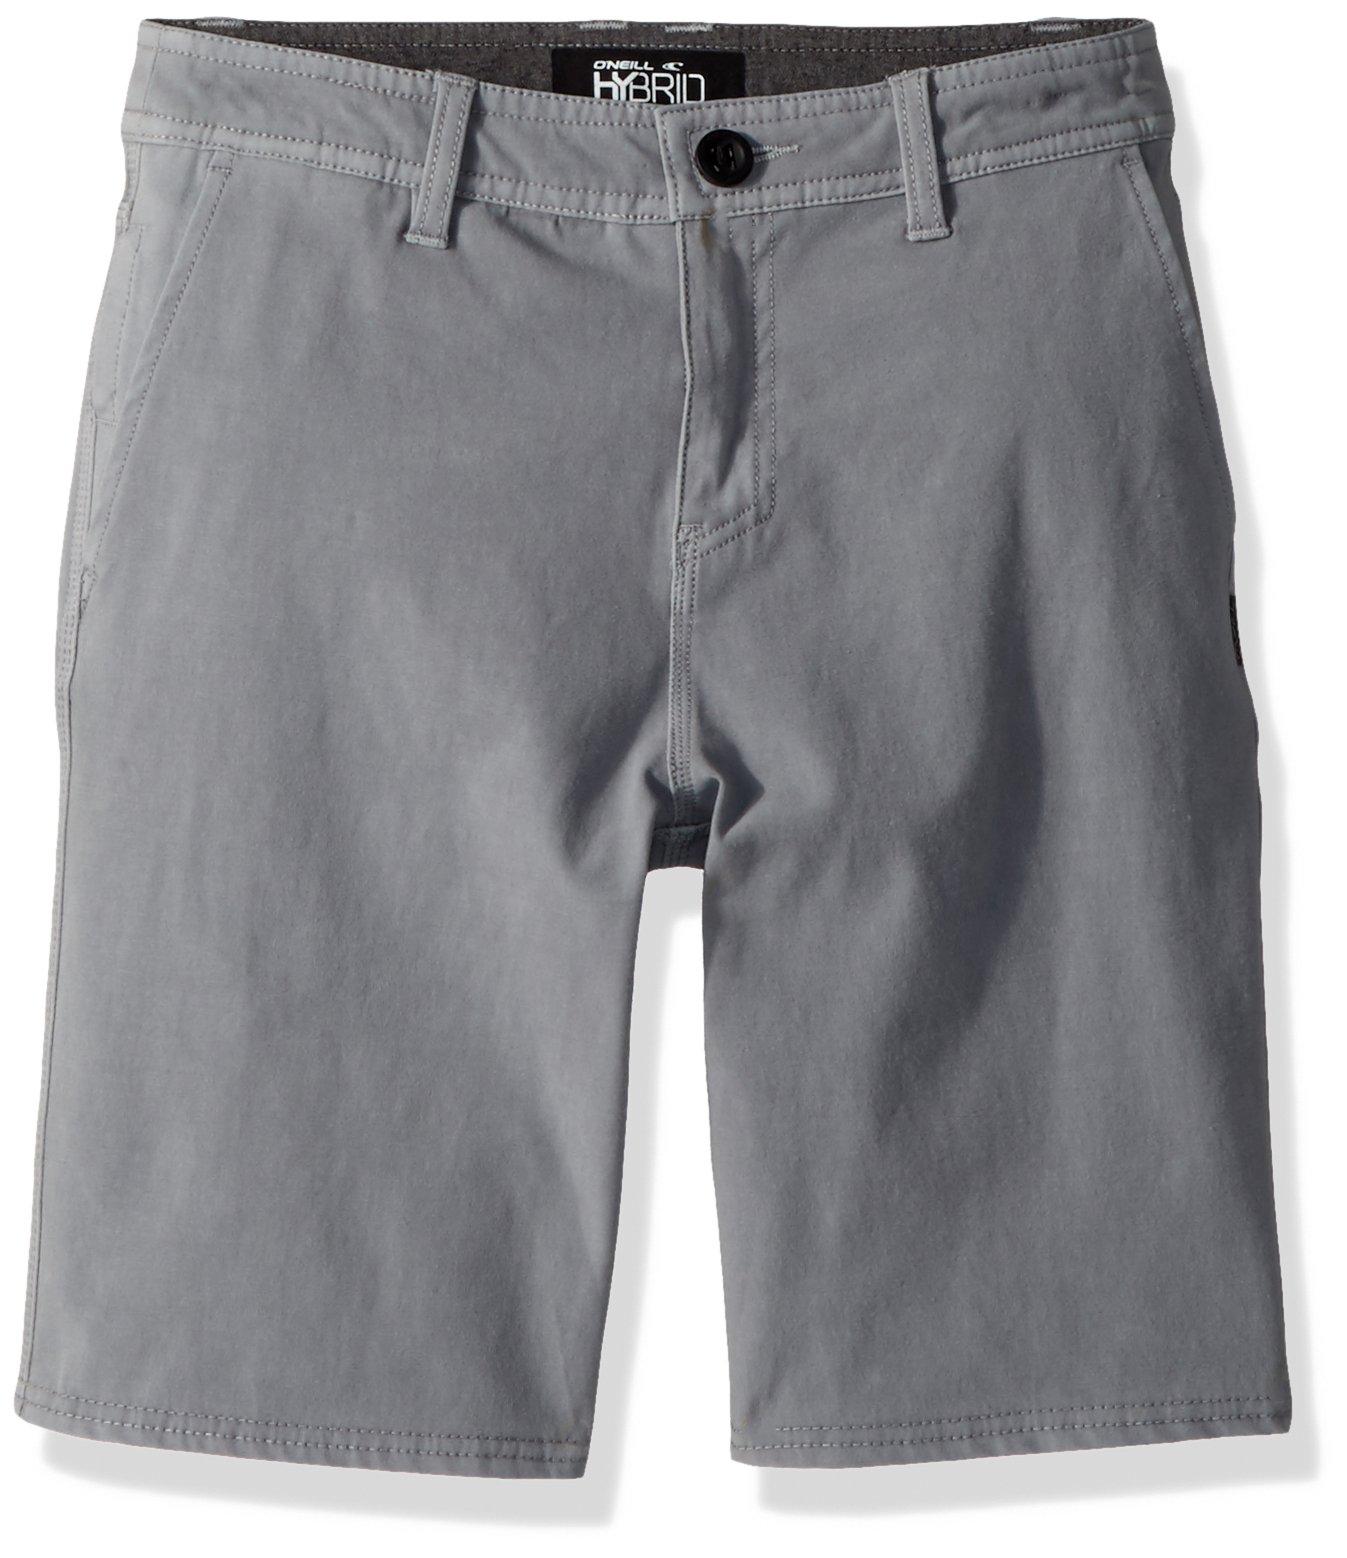 O'Neill Big Boys' Venture Overdye Short Boardshort, Light Grey, 26